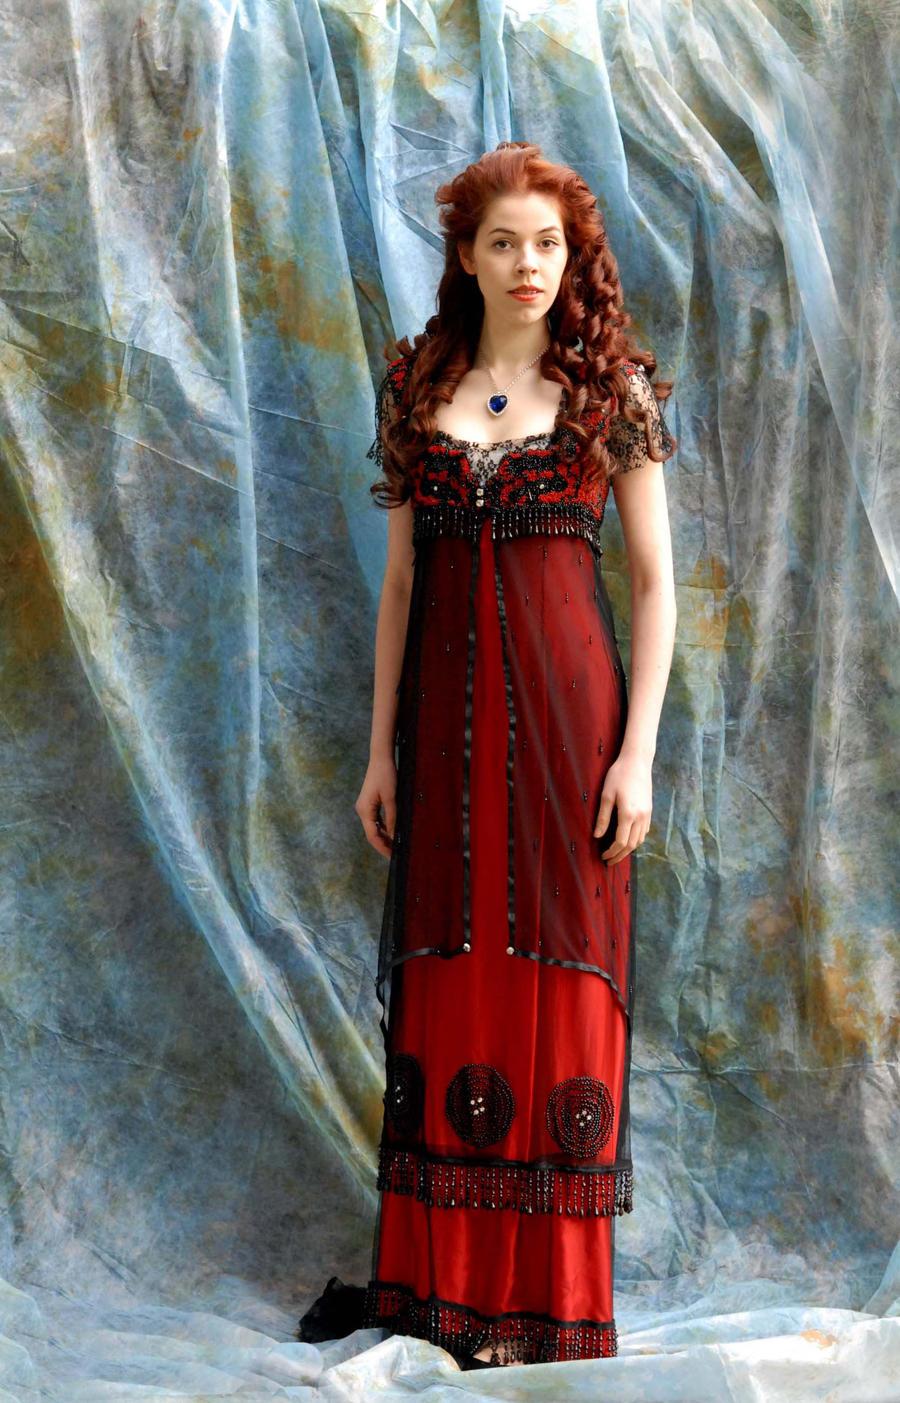 Kate Winslet Titanic Red Dress   www.pixshark.com - Images ...